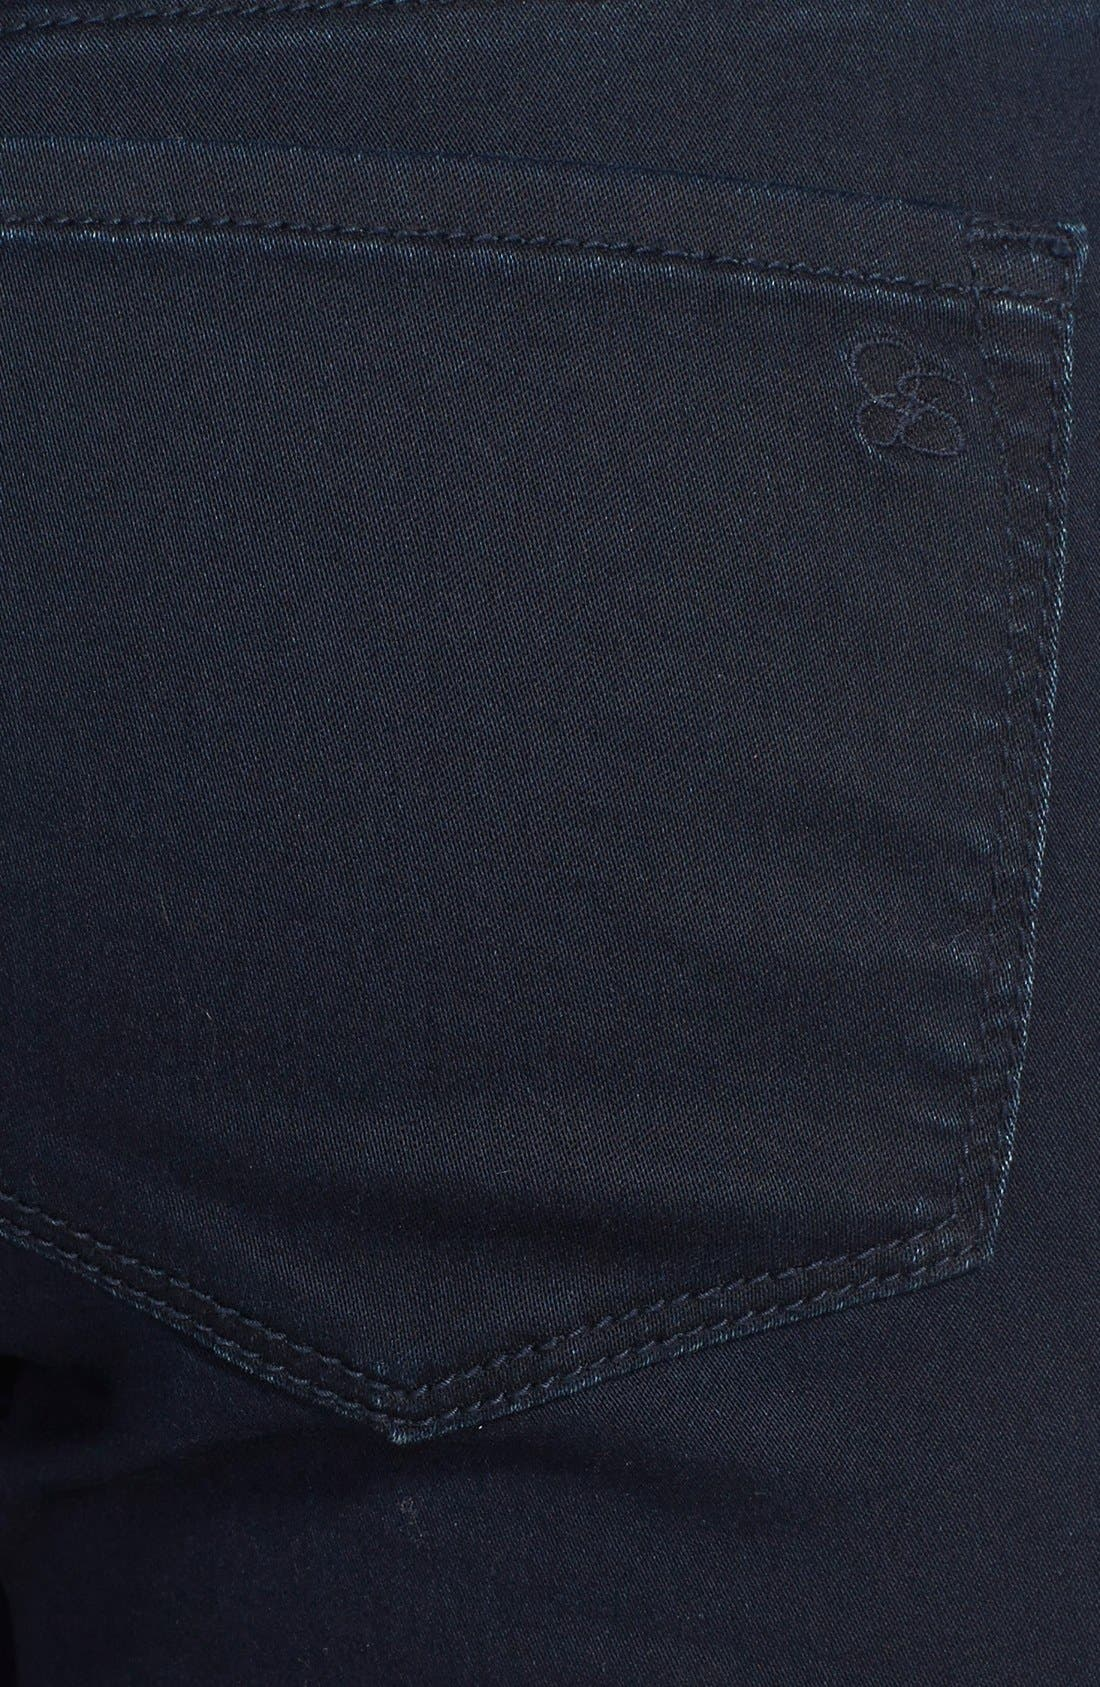 Alternate Image 3  - Jessica Simpson 'Kiss Me' Super Skinny Jeans (Enzyme Rinse)